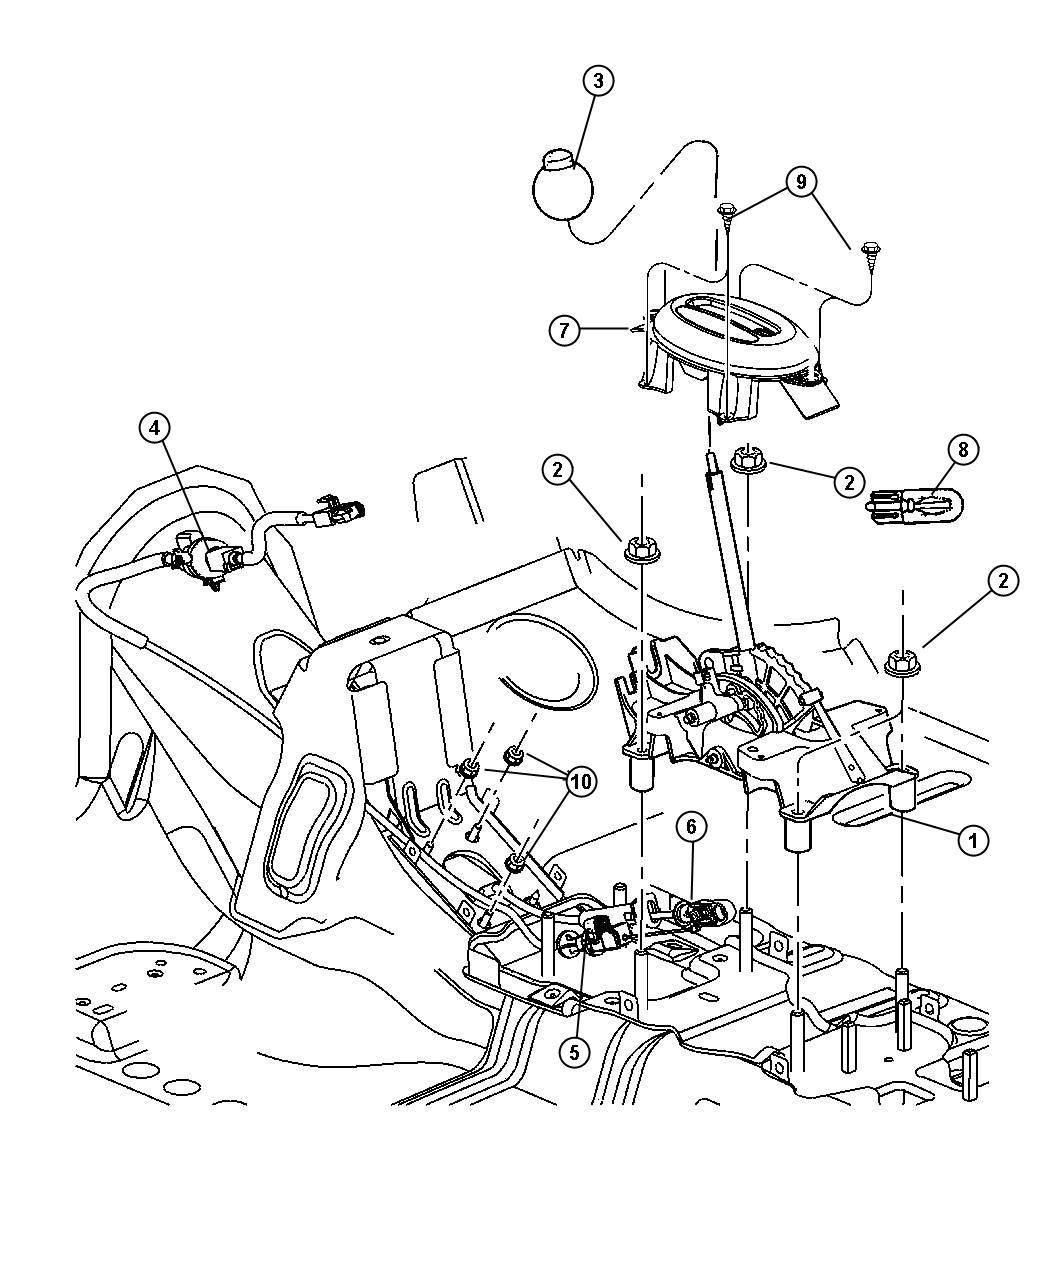 Dodge Grand Caravan Cable Ignition Interlock